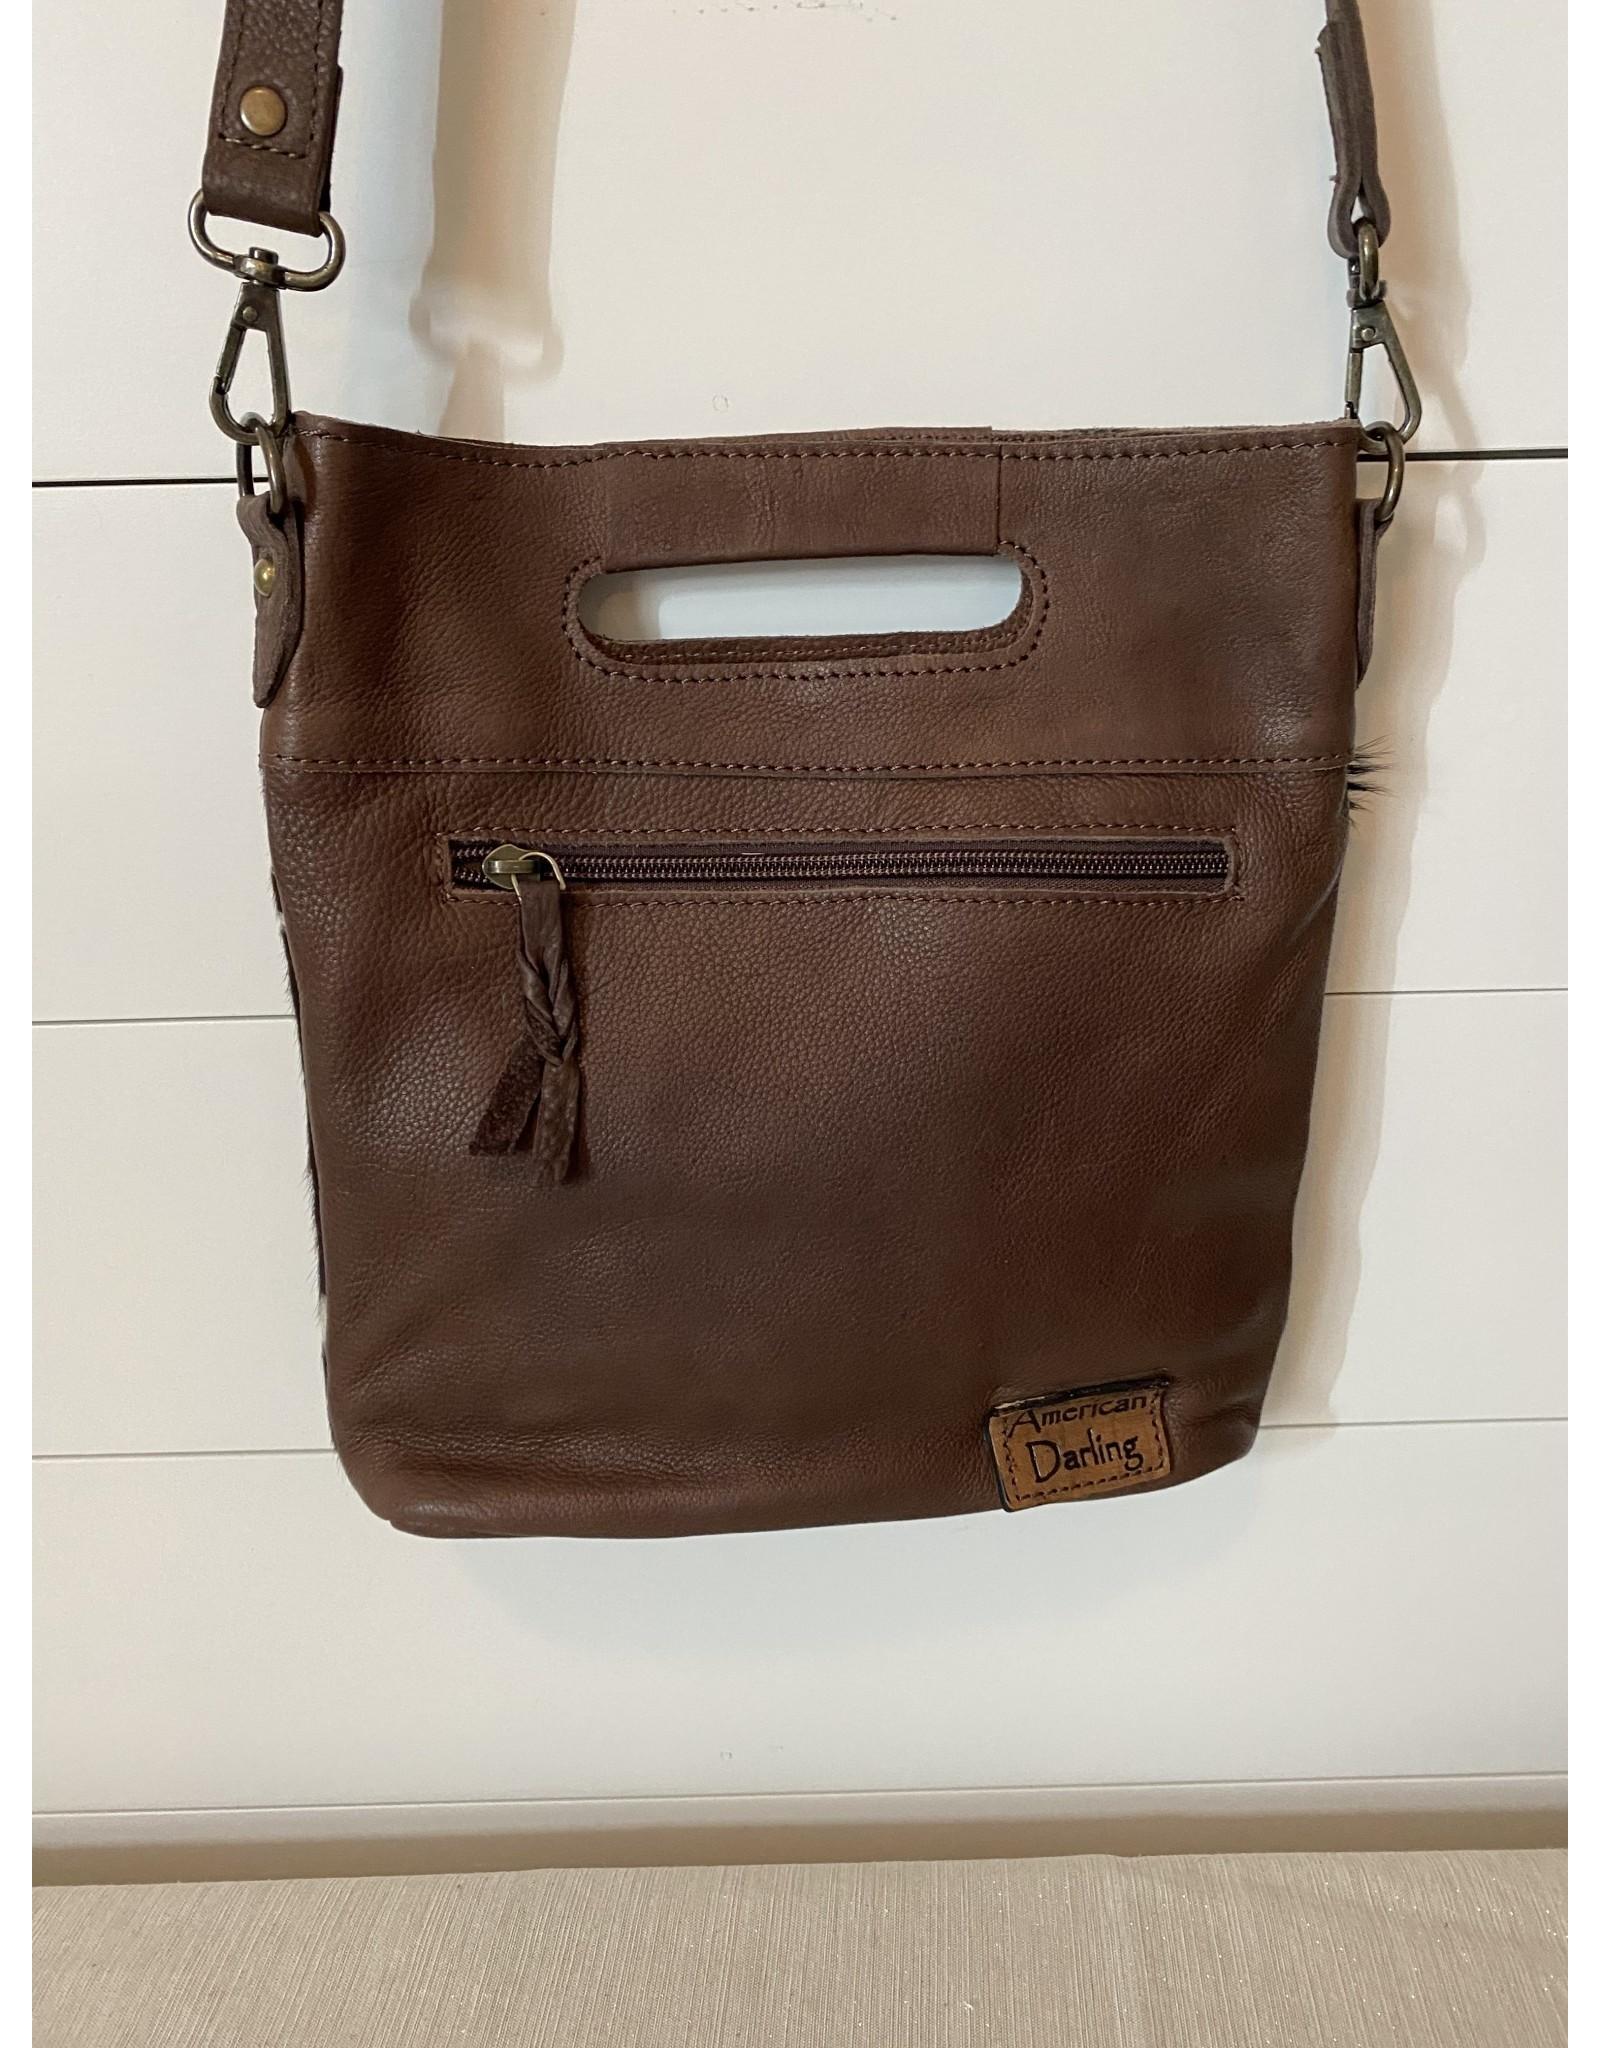 American Darling Norman Leather Bag